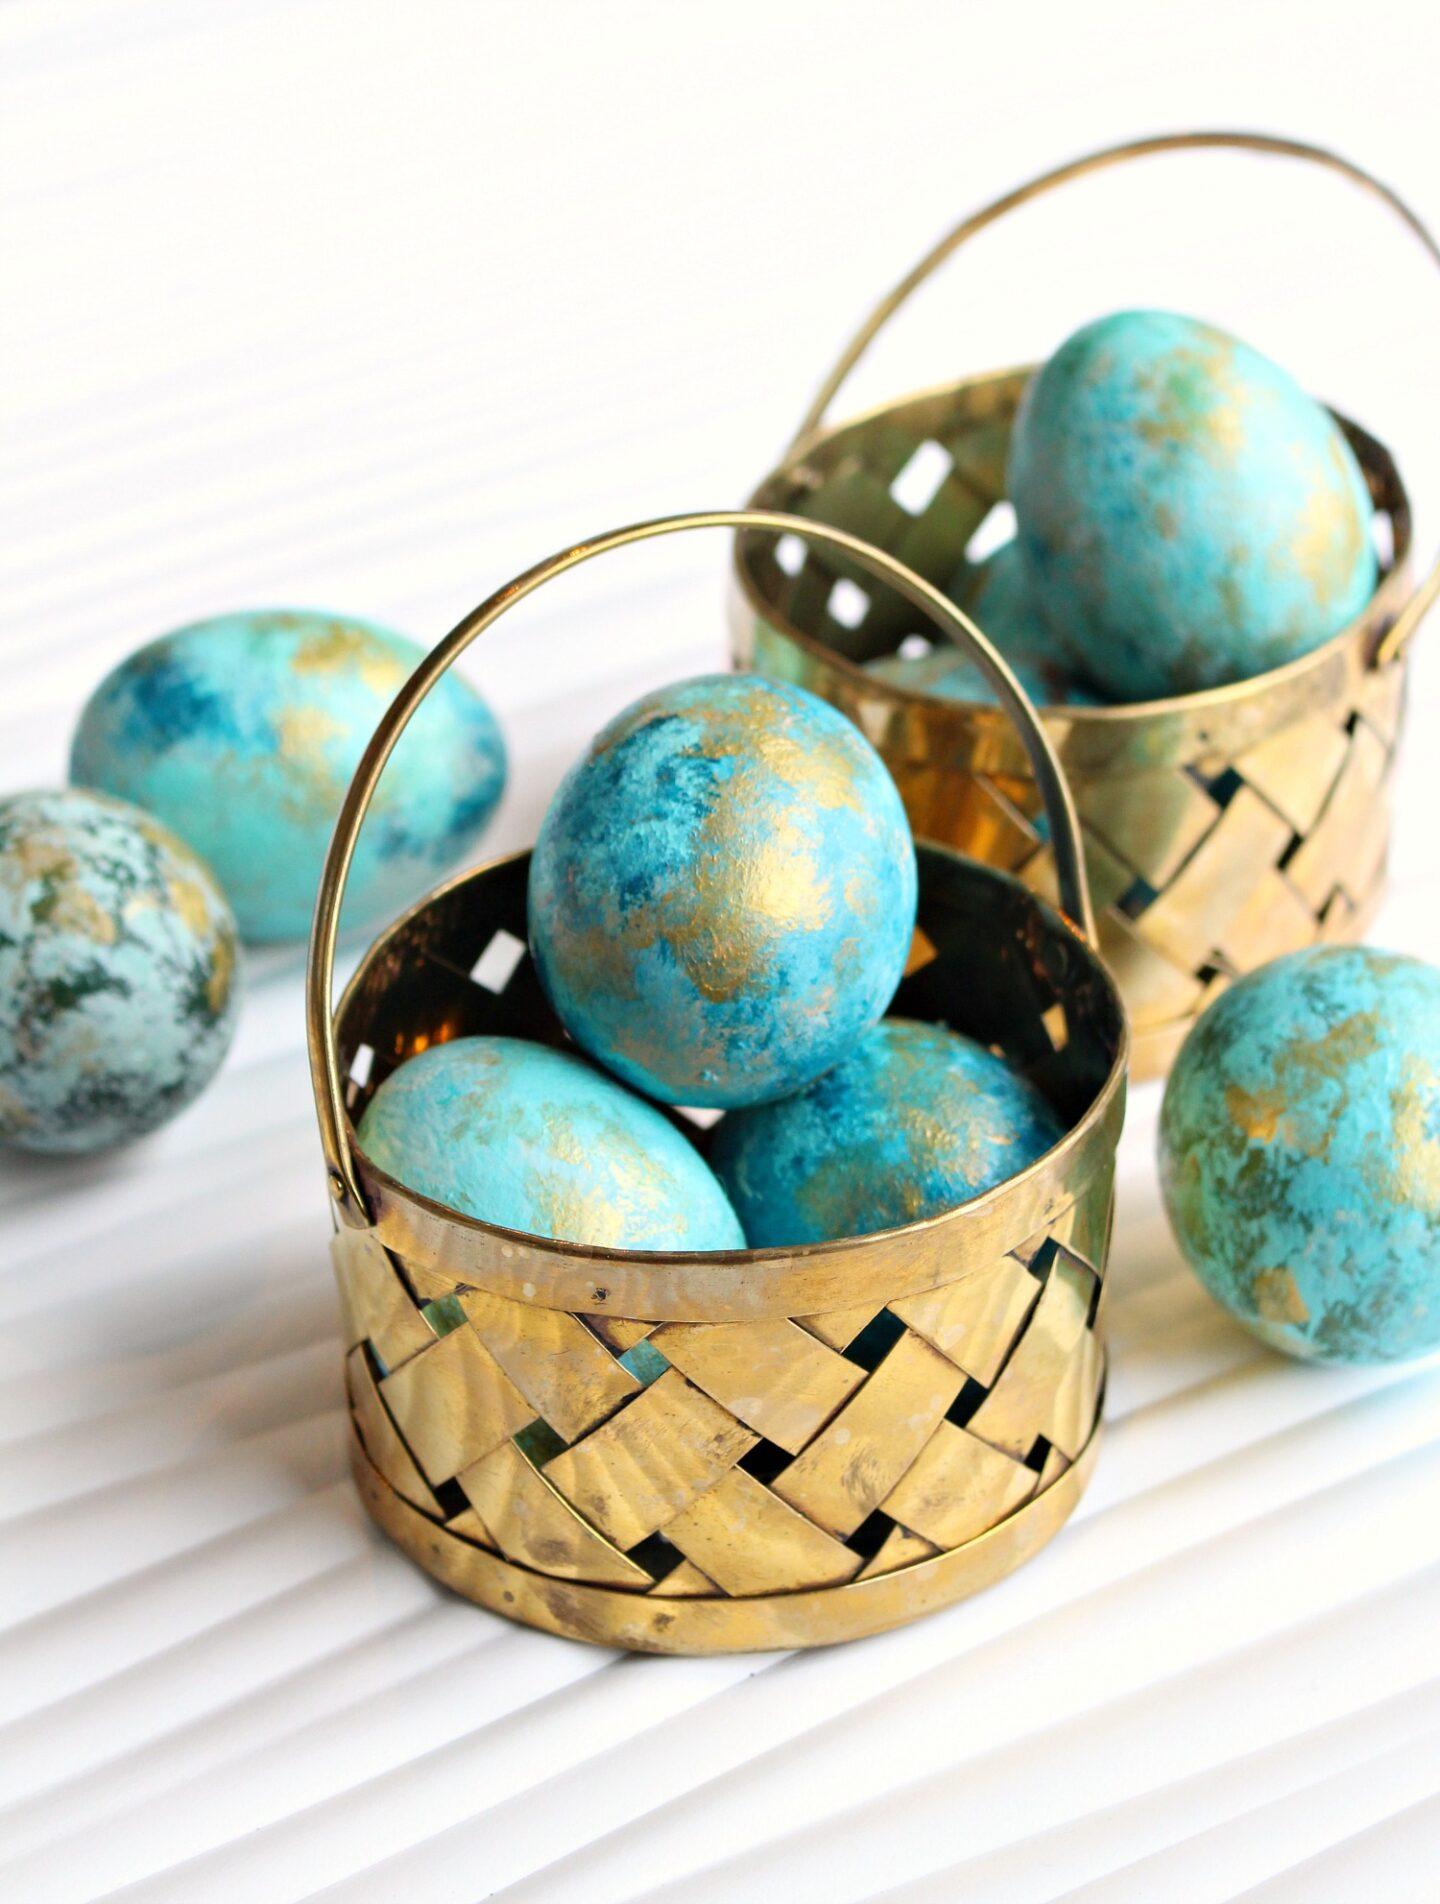 Easy Egg Decorating Idea for Kids